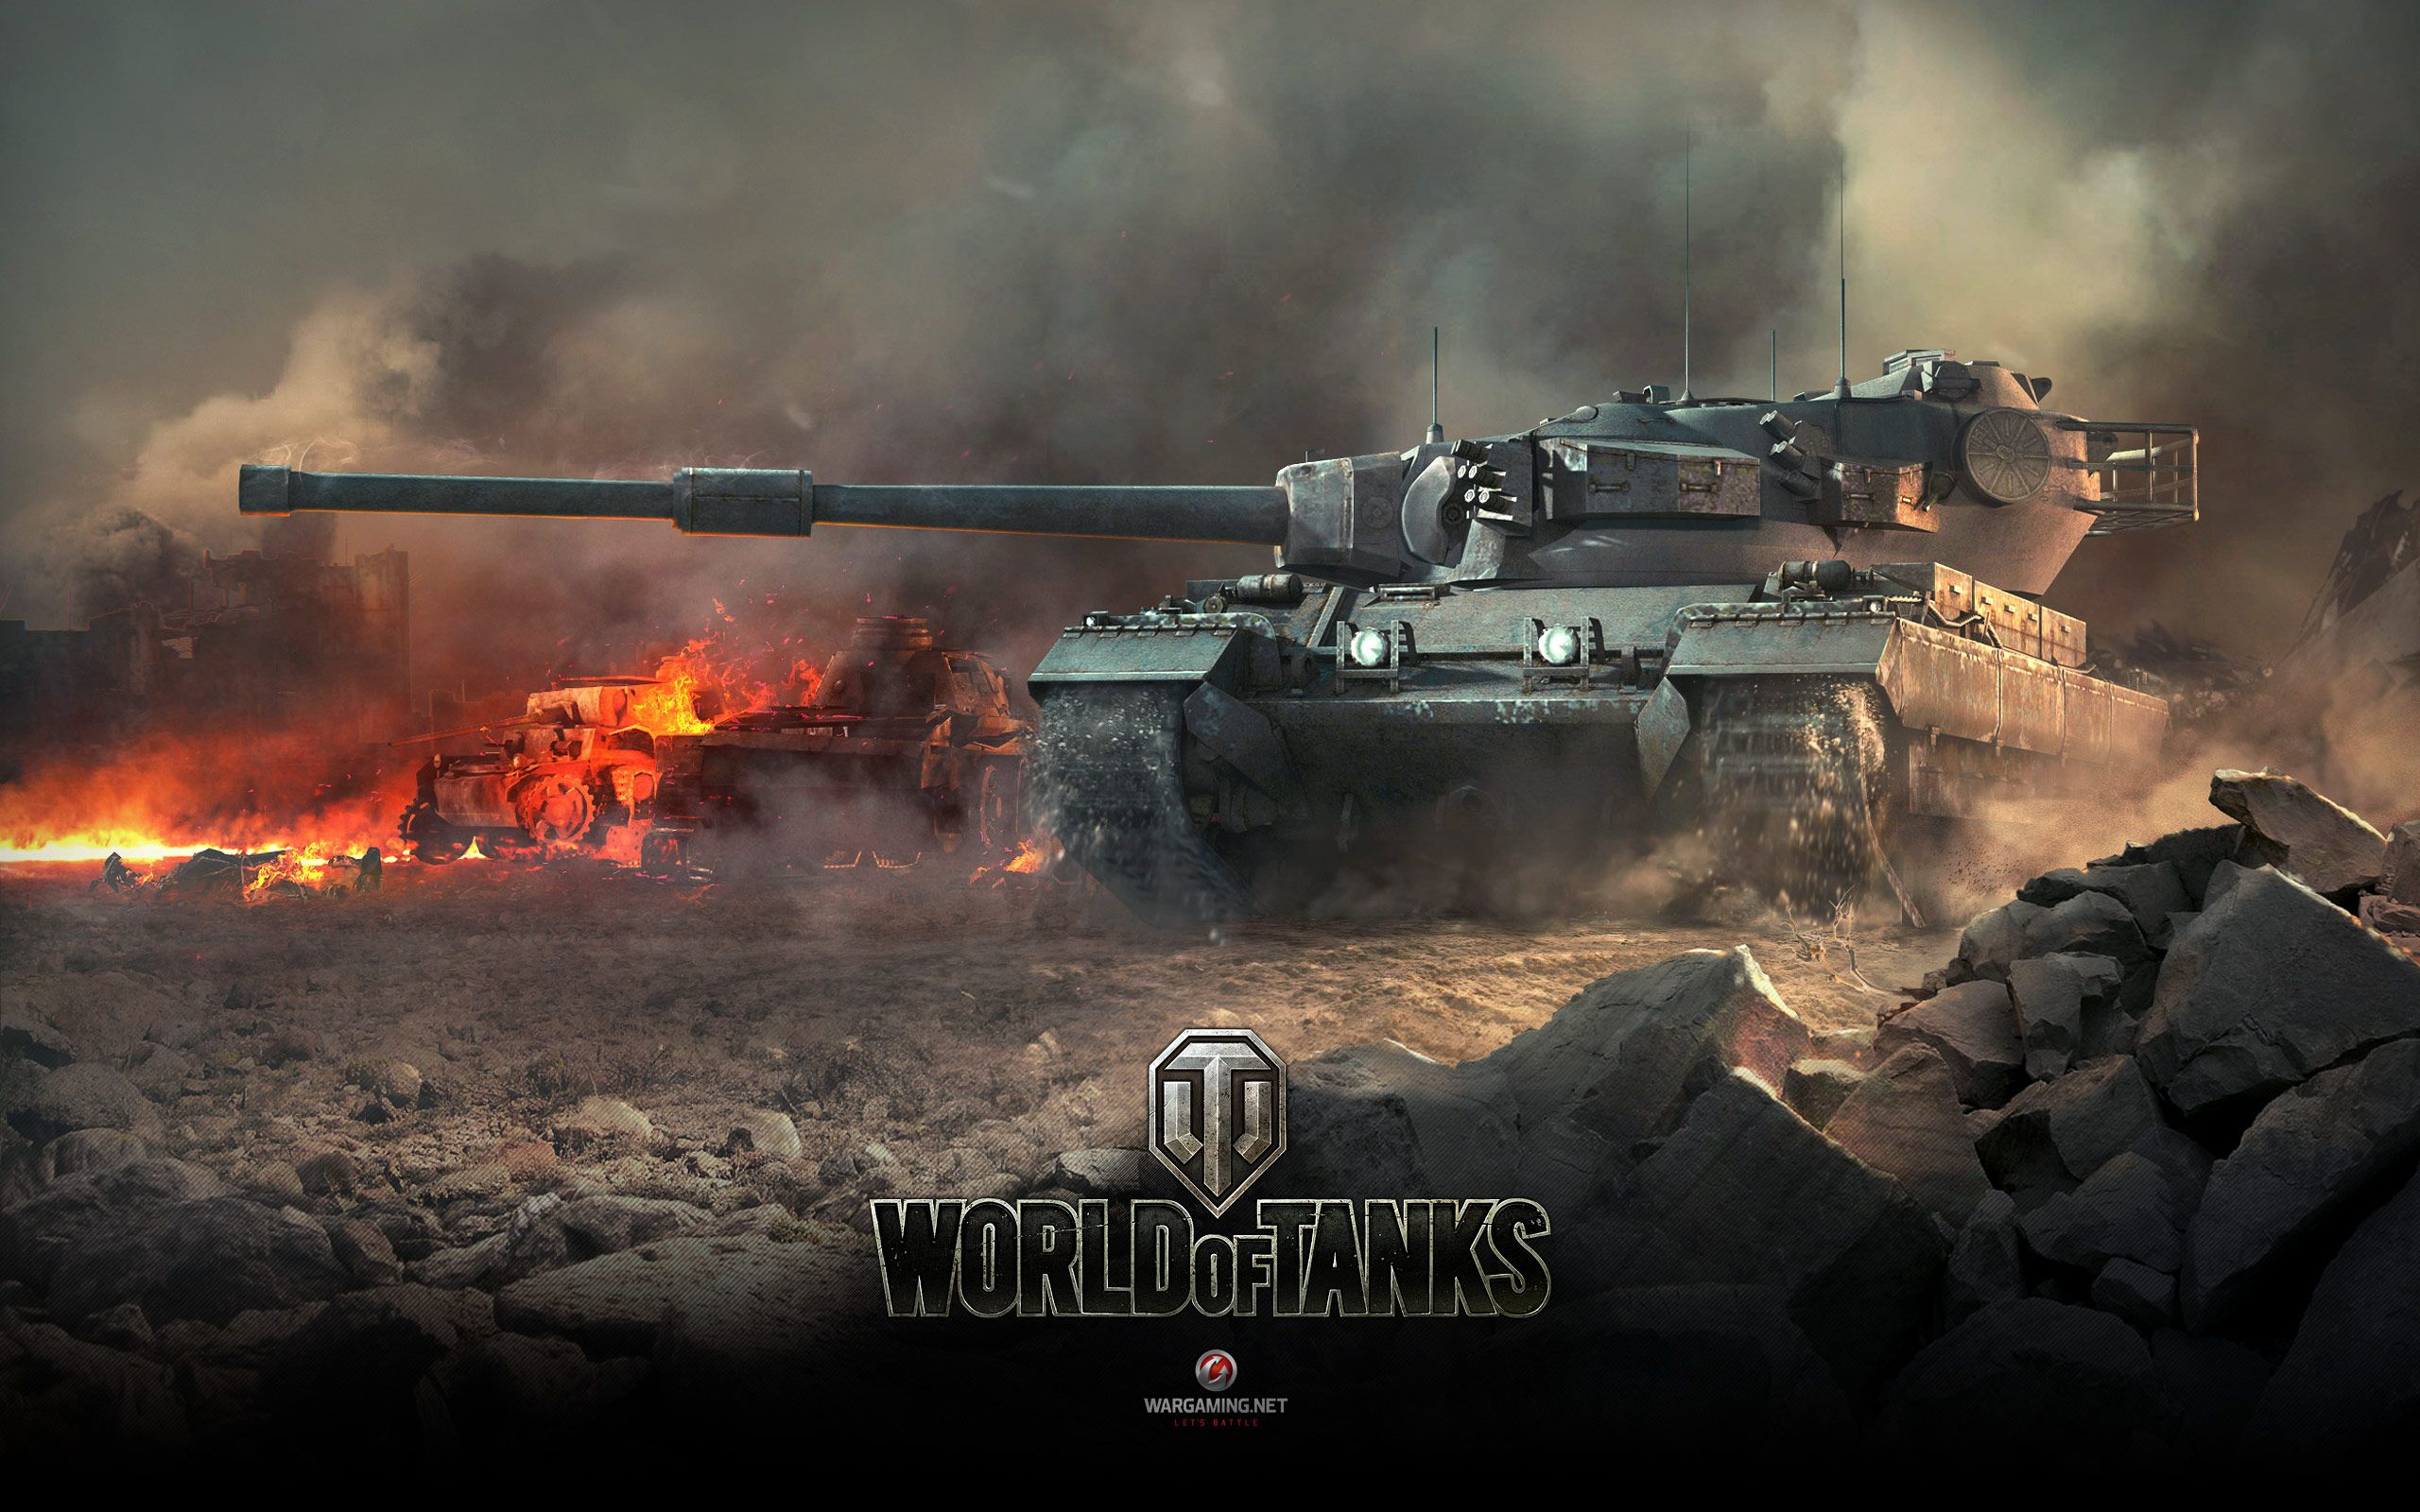 TE World of Tanks Wallpaper